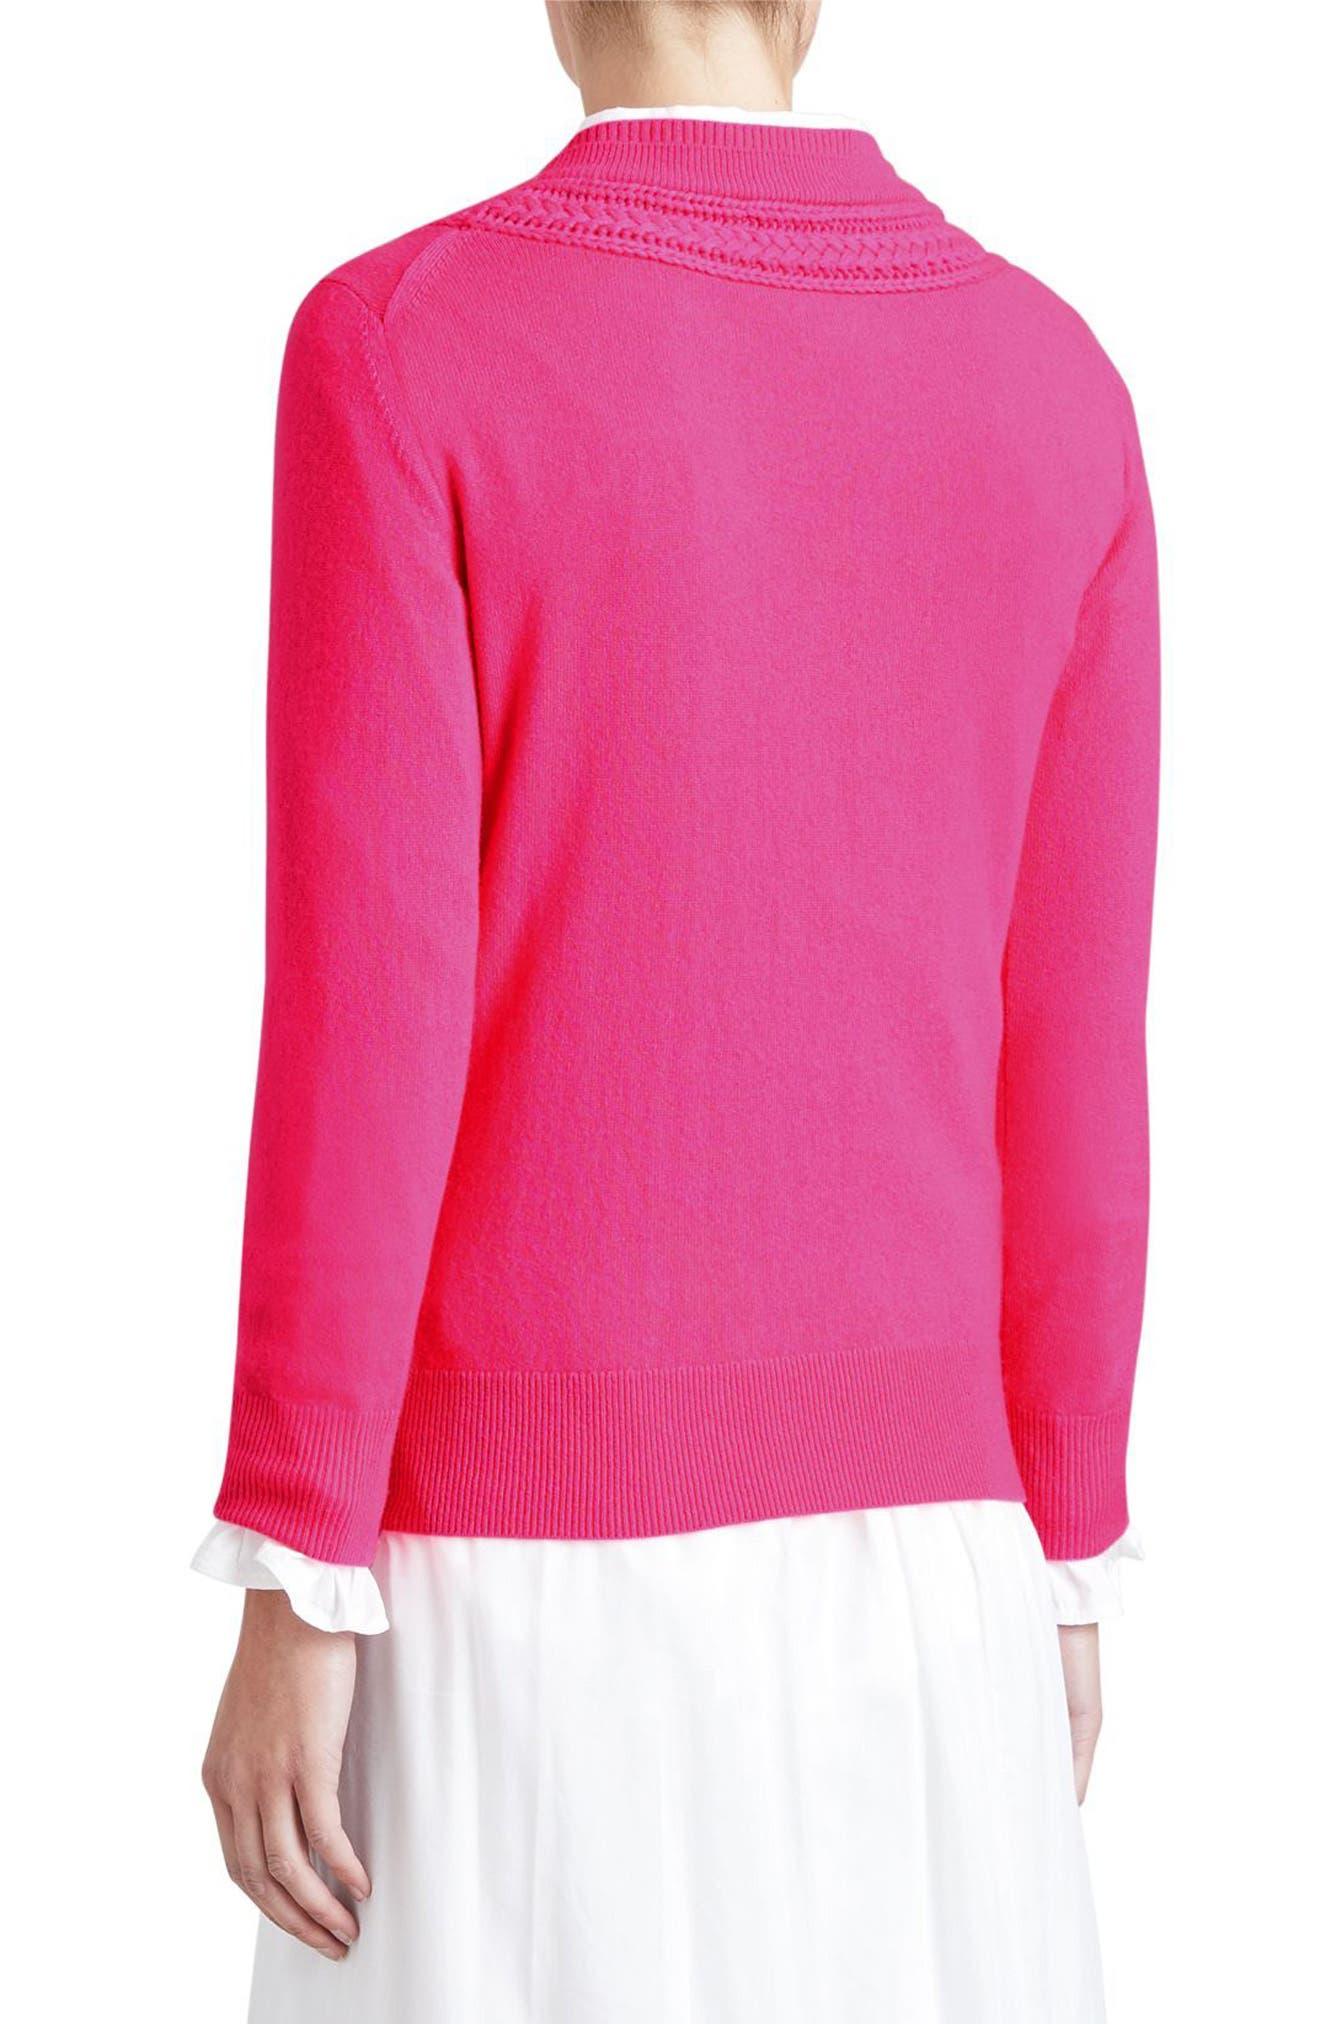 Guadaira Cashmere Sweater,                             Alternate thumbnail 2, color,                             671